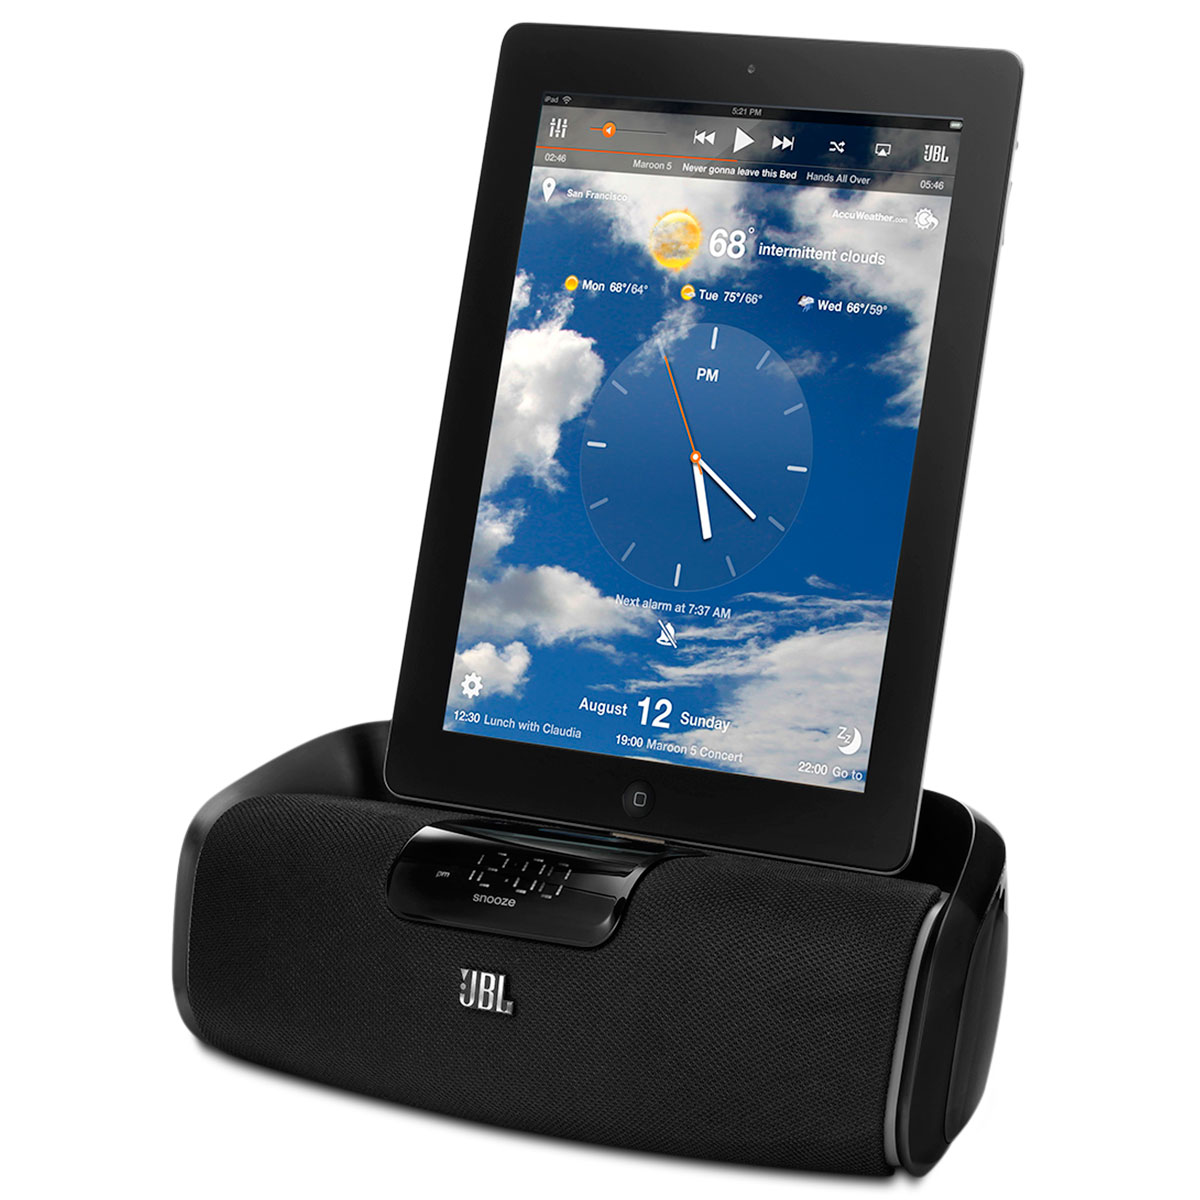 OnBeataWake - Dock Station p/ iPod / iPhone / iPad On Beat a Wake JBL